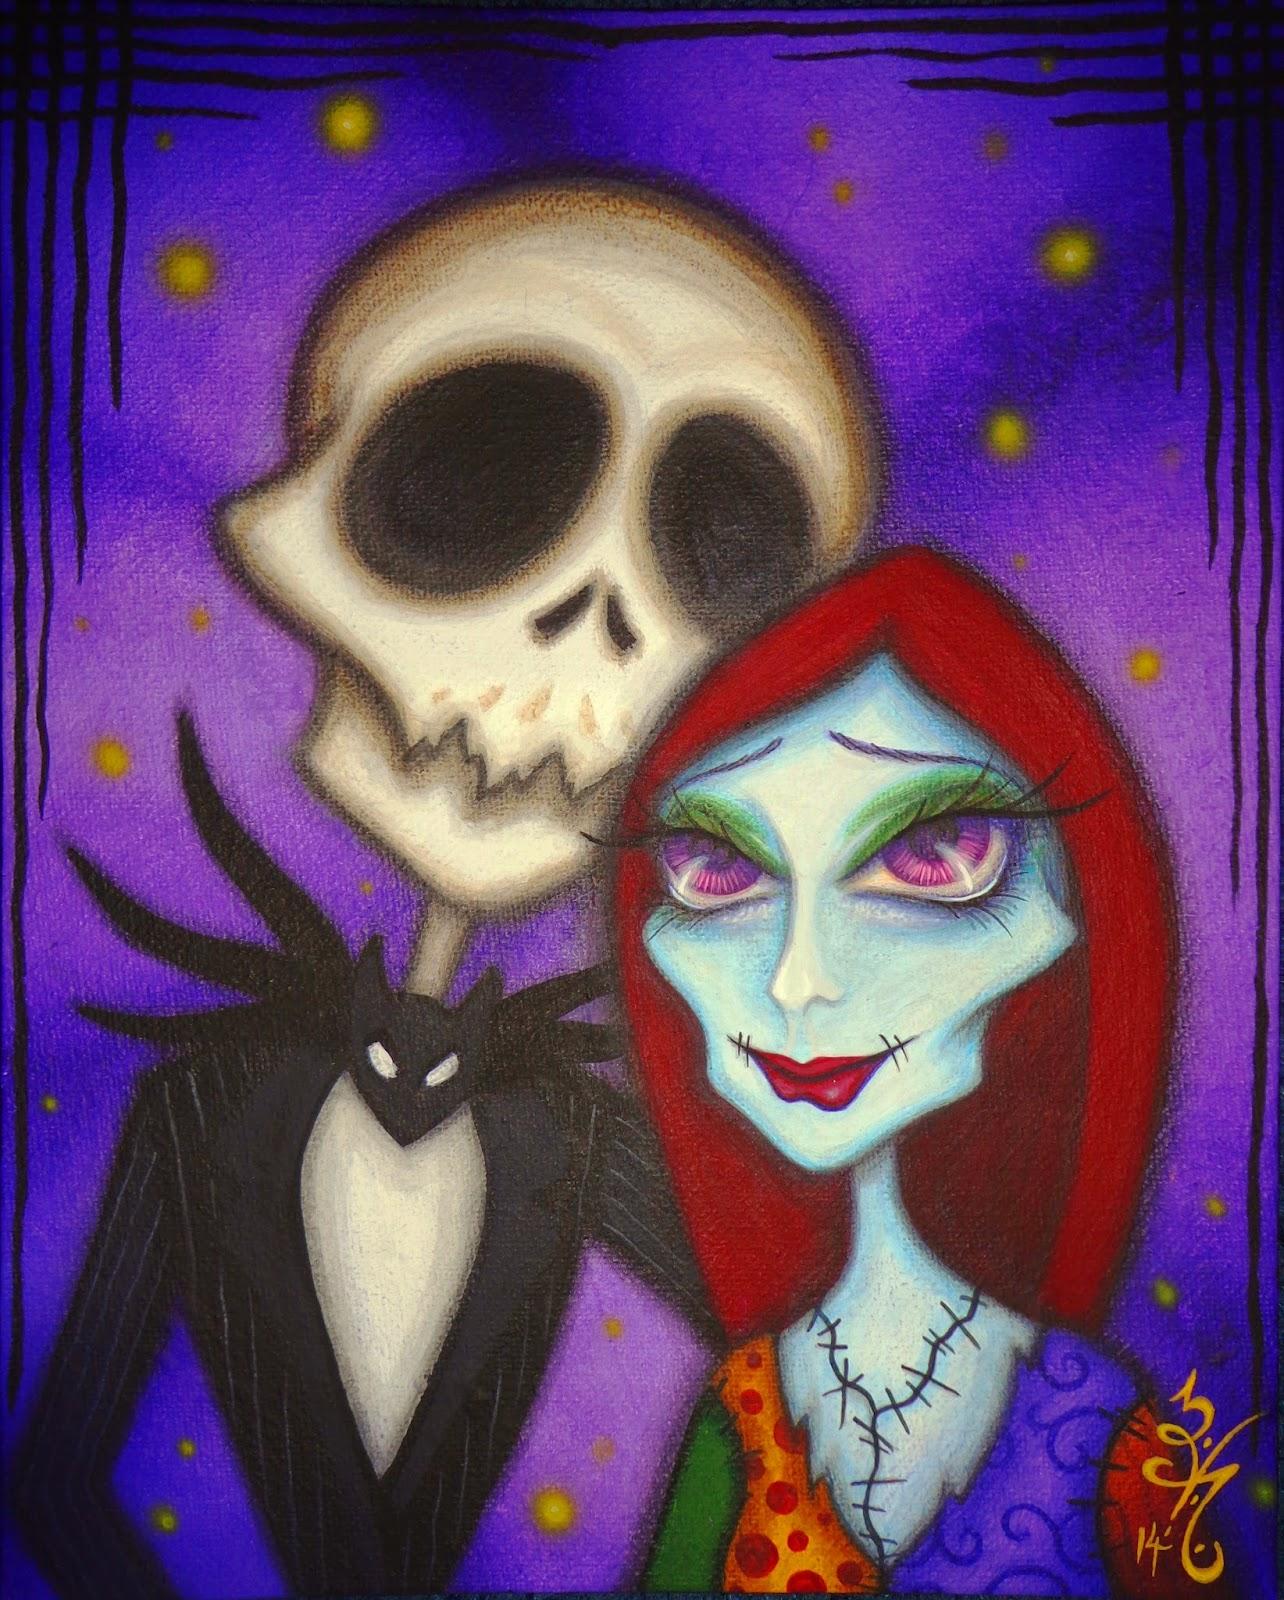 https://www.etsy.com/listing/206275374/original-fantasy-lowbrow-halloween?ref=shop_home_active_1